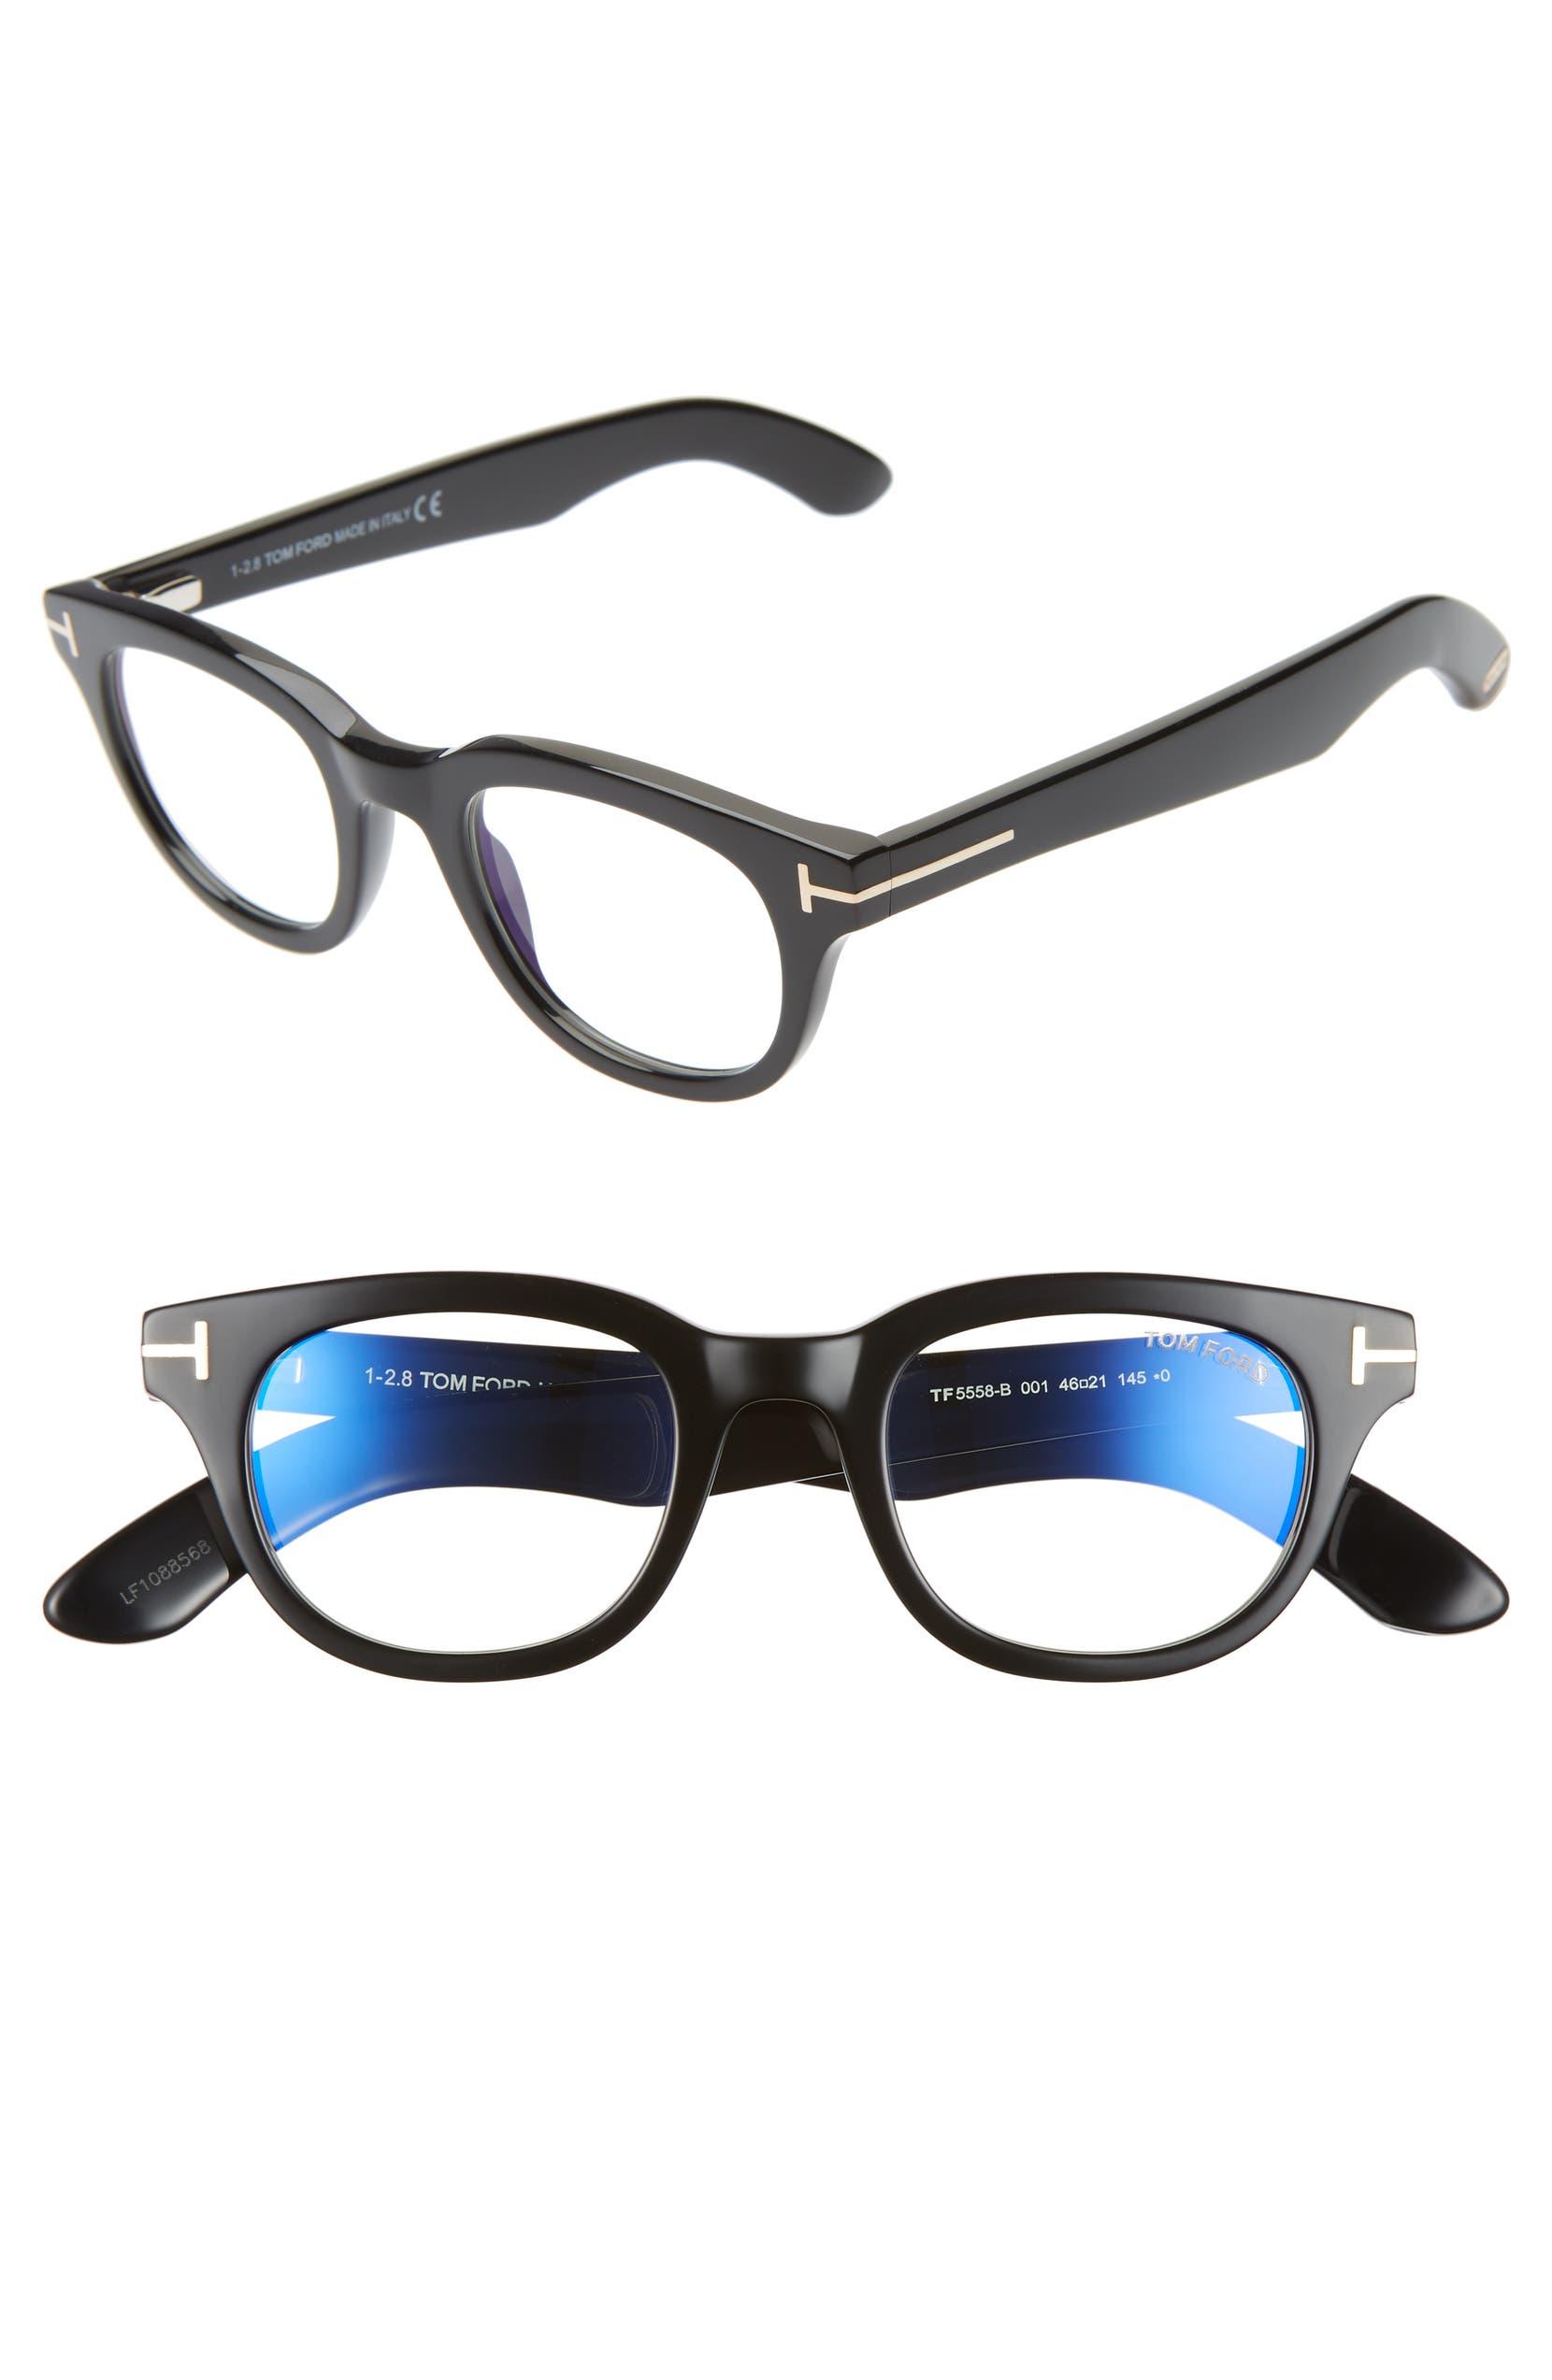 6393f73c1d0 Tom Ford 46mm Blue Light Blocking Glasses